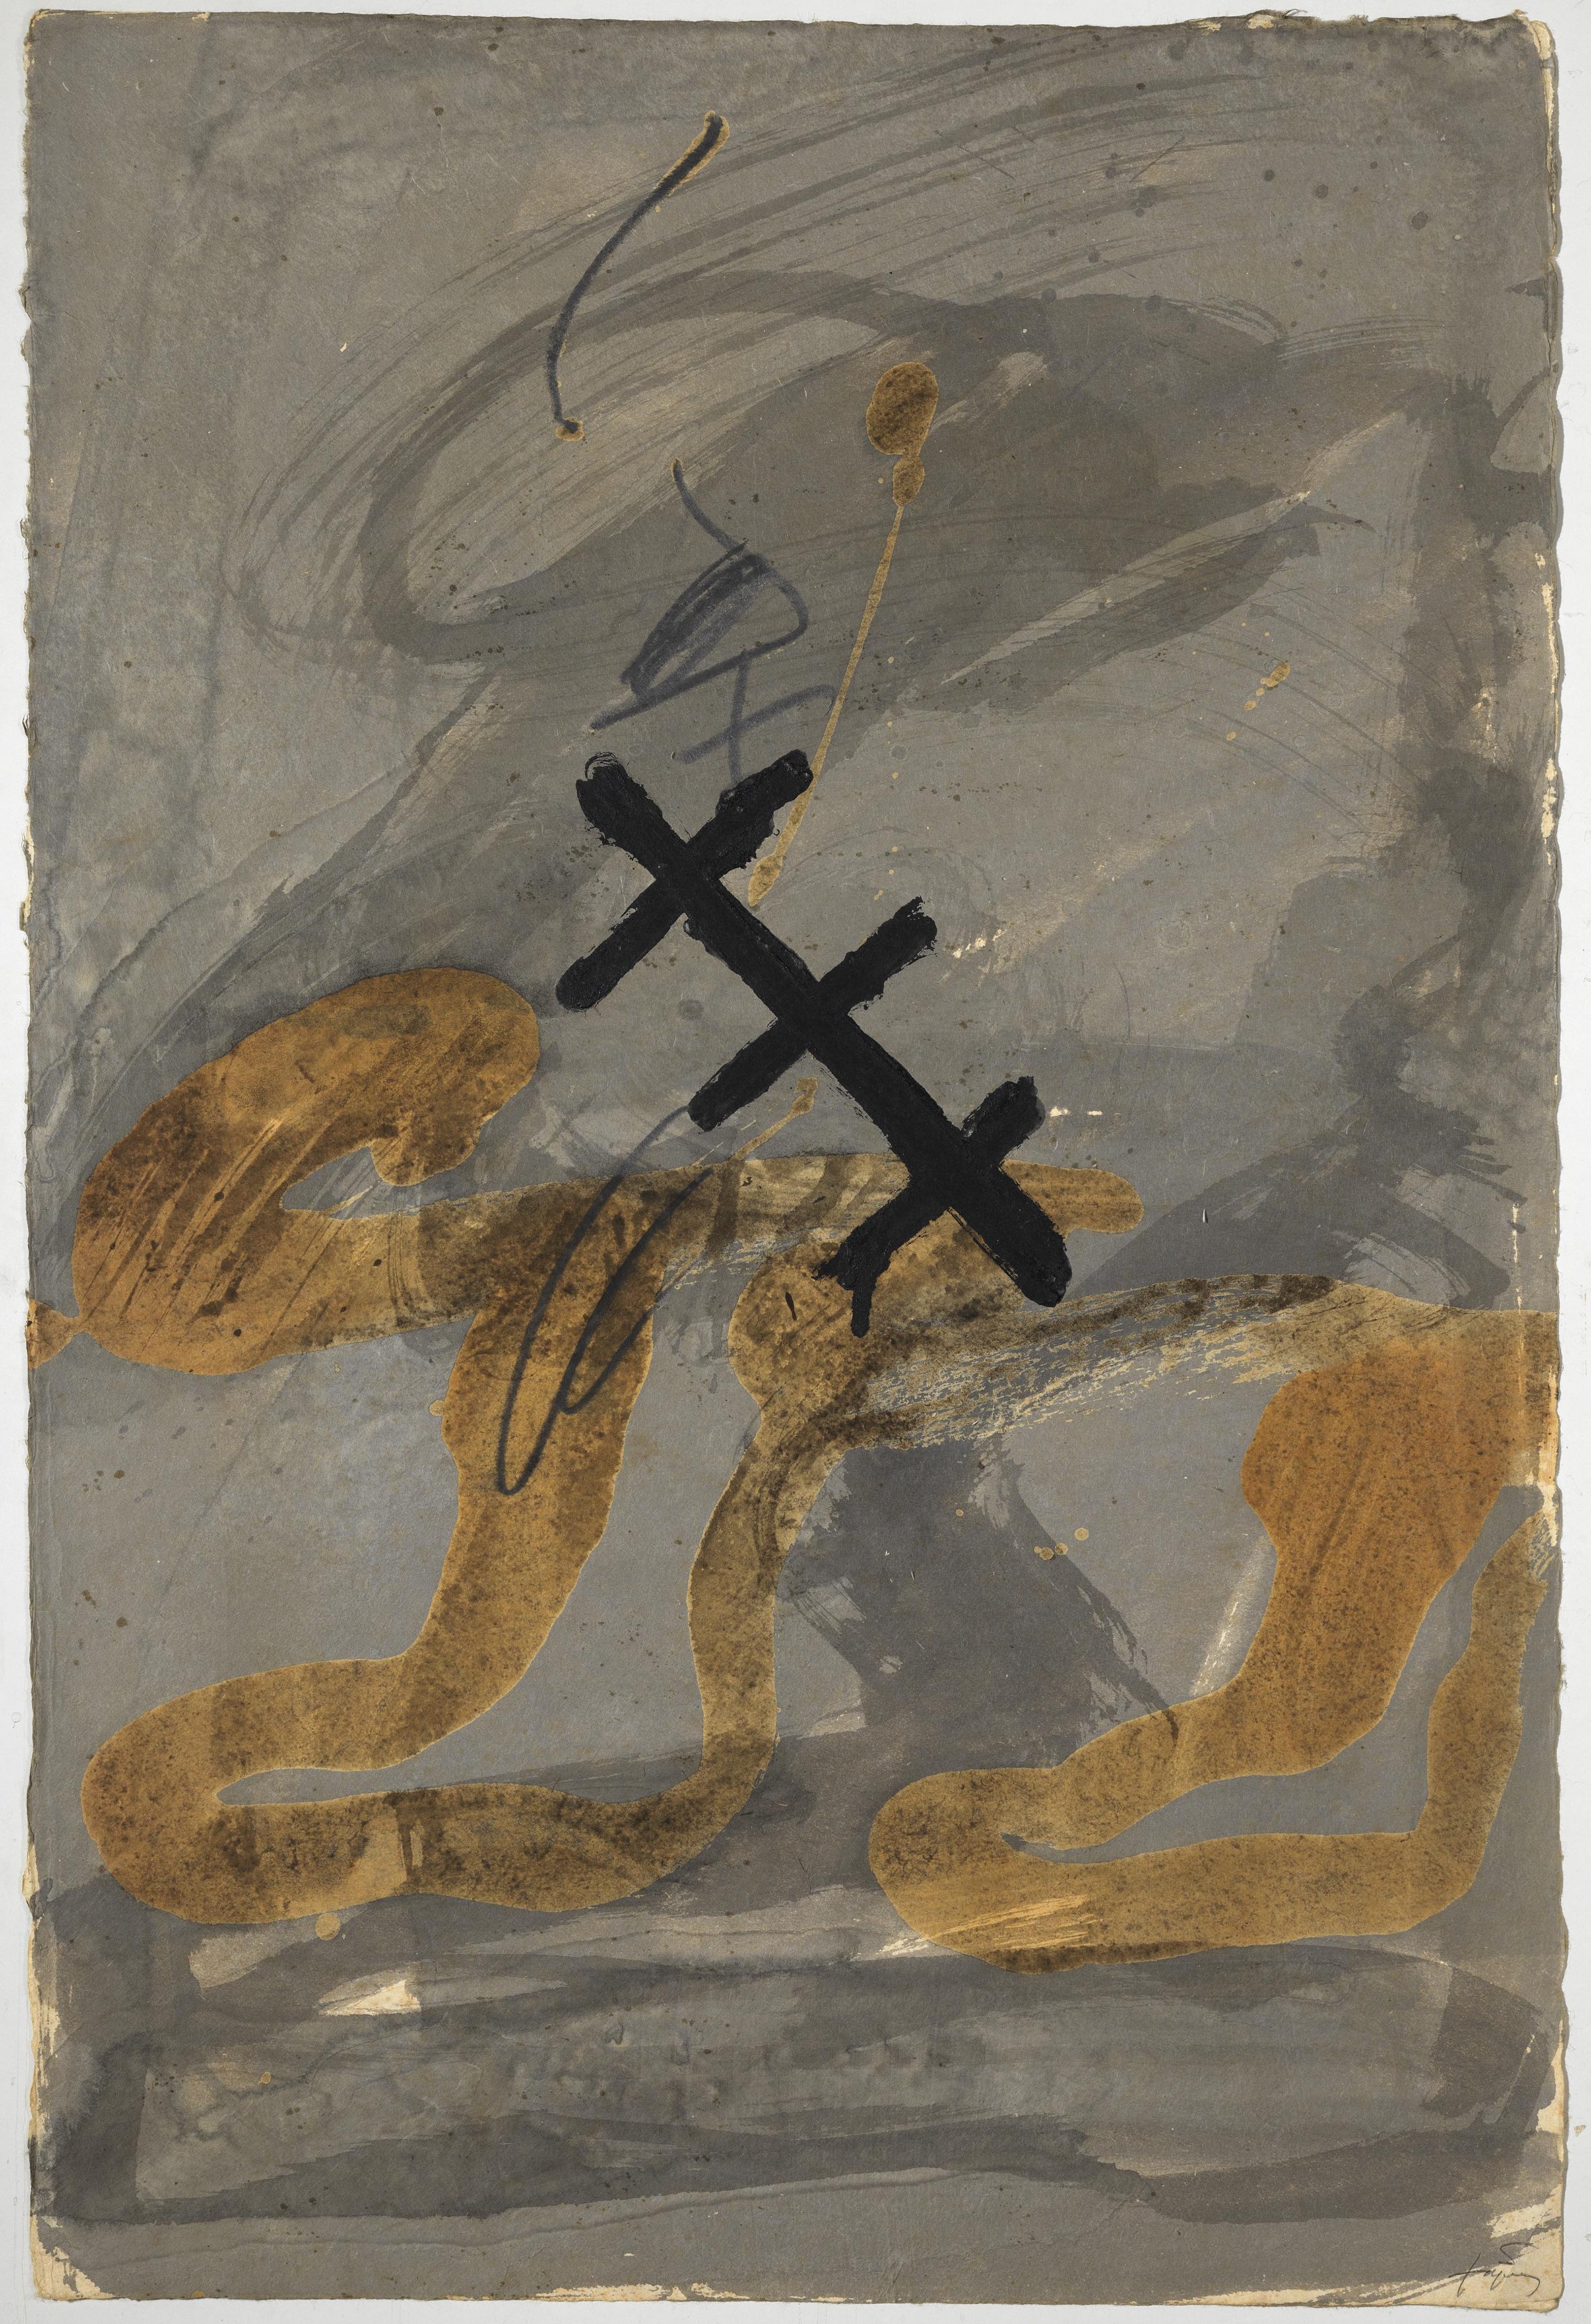 Antoni tapies temps matiere memoire galerie lelong w19797dospeussobregrishd original